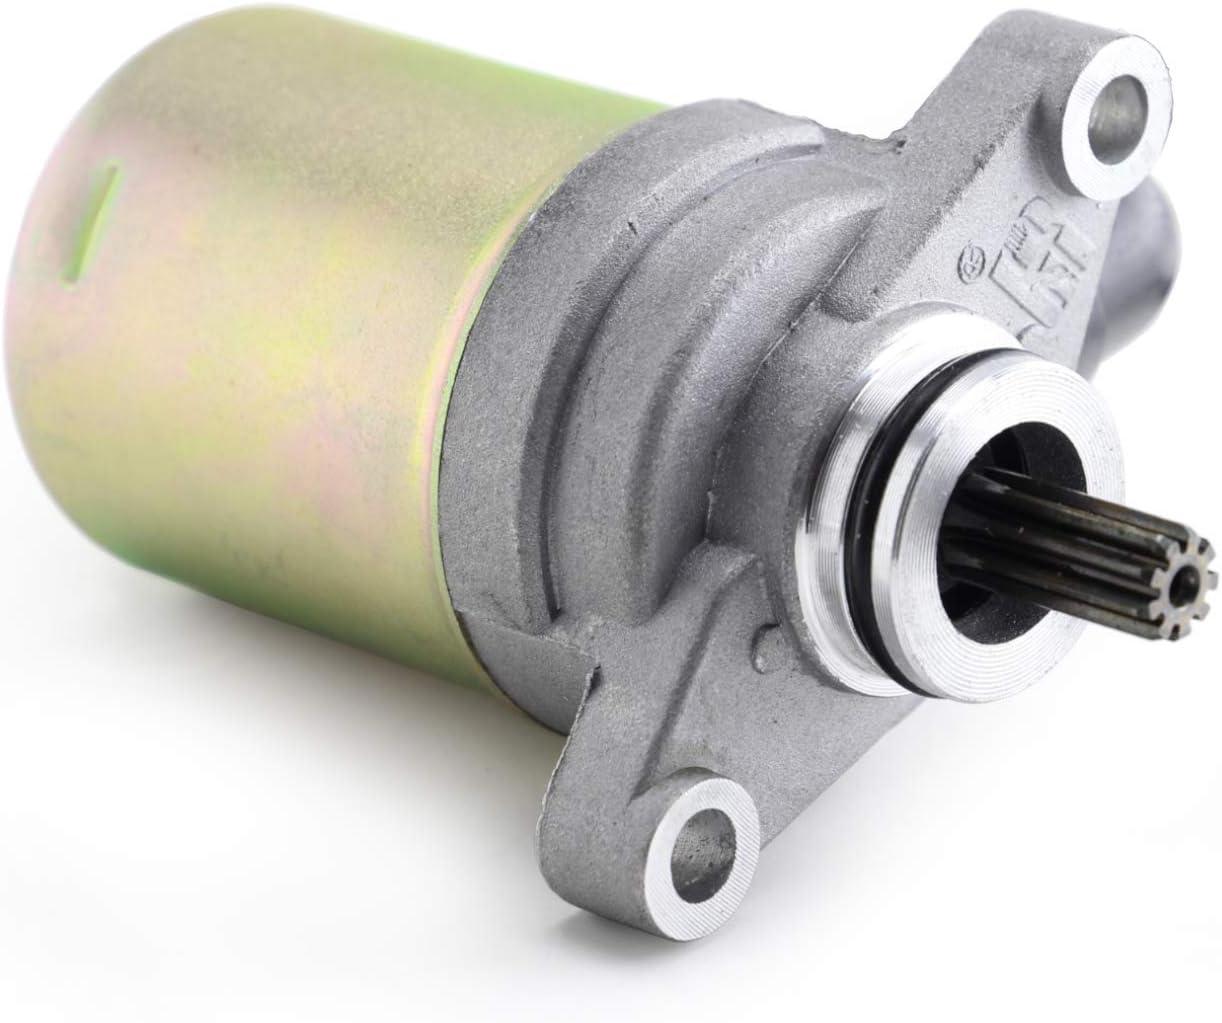 CPI China 2 - Takt Motoren Ersatz Anlasser Starter Motor f/ür ATU Generic 50 ccm Keeway